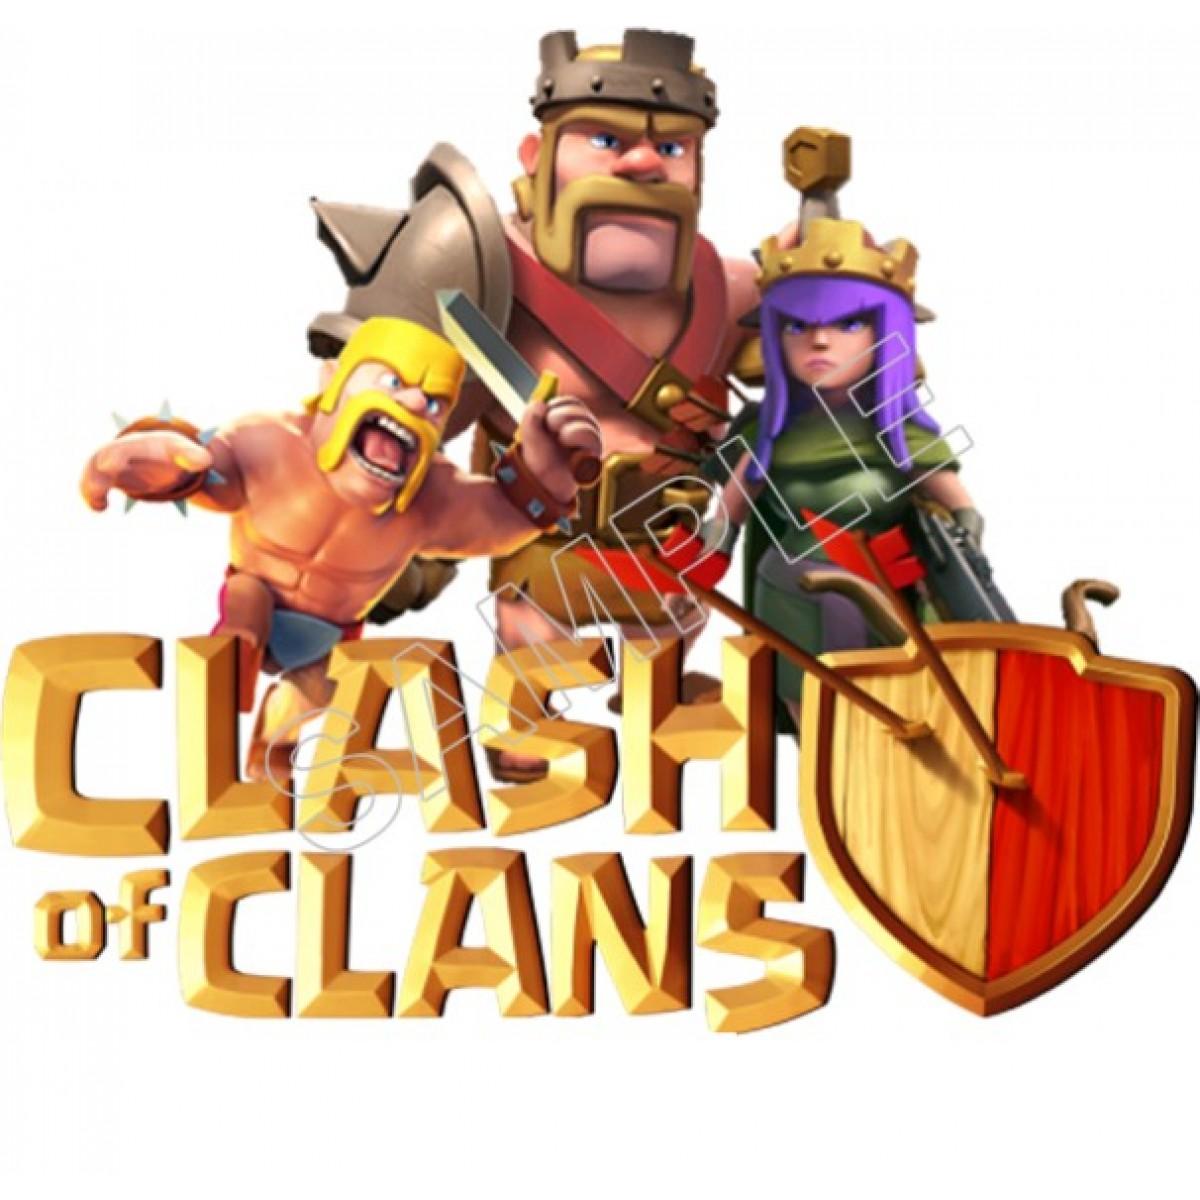 Coc Clan Logos Wwwtollebildcom